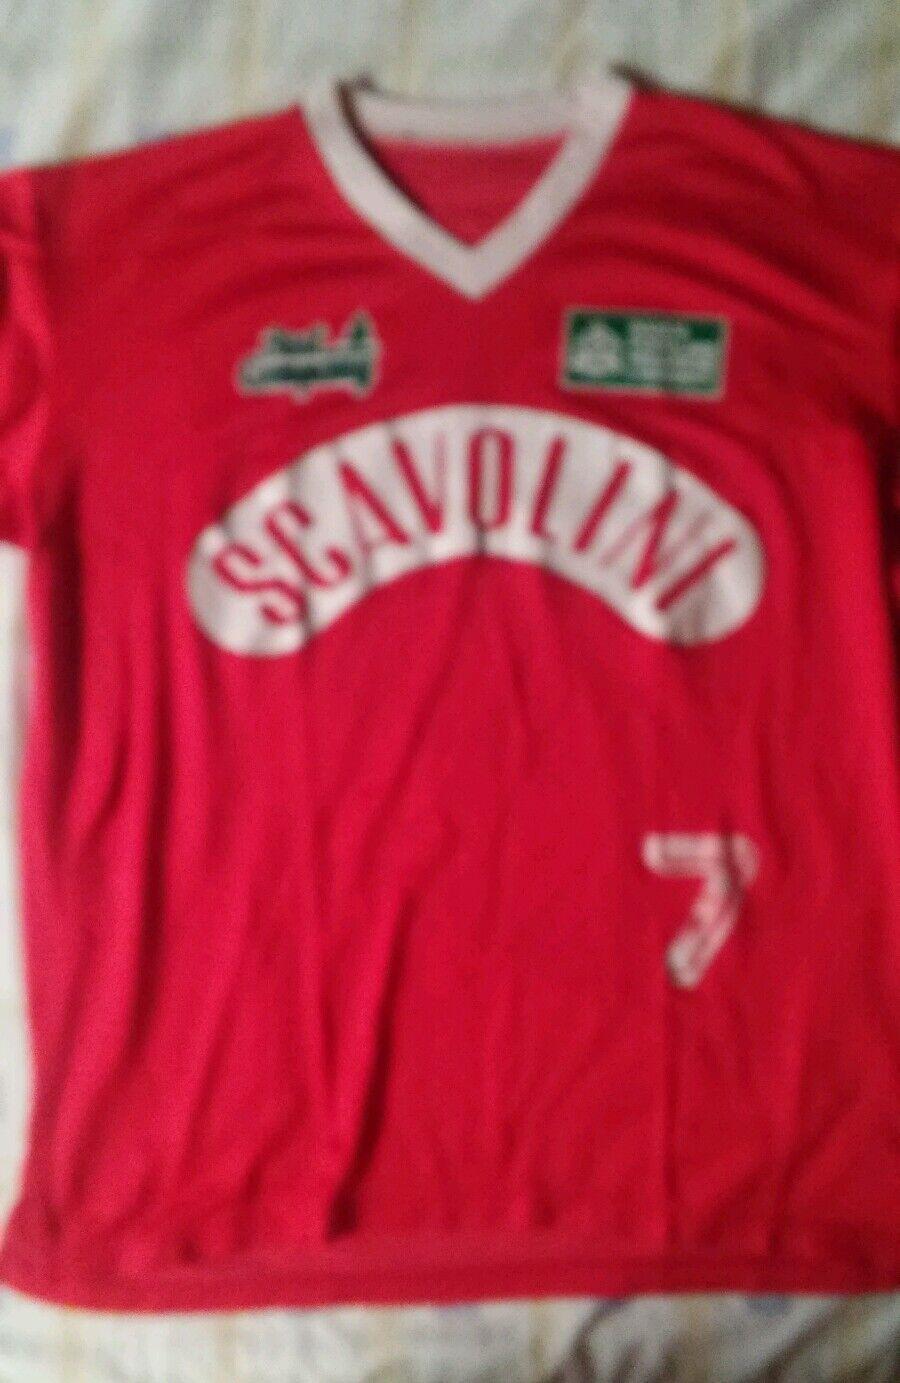 Camiseta jersey shirt maillot maglia trikot SCAVOLINI DE PESARO ITALIA ITALIA PESARO  XL 58853a